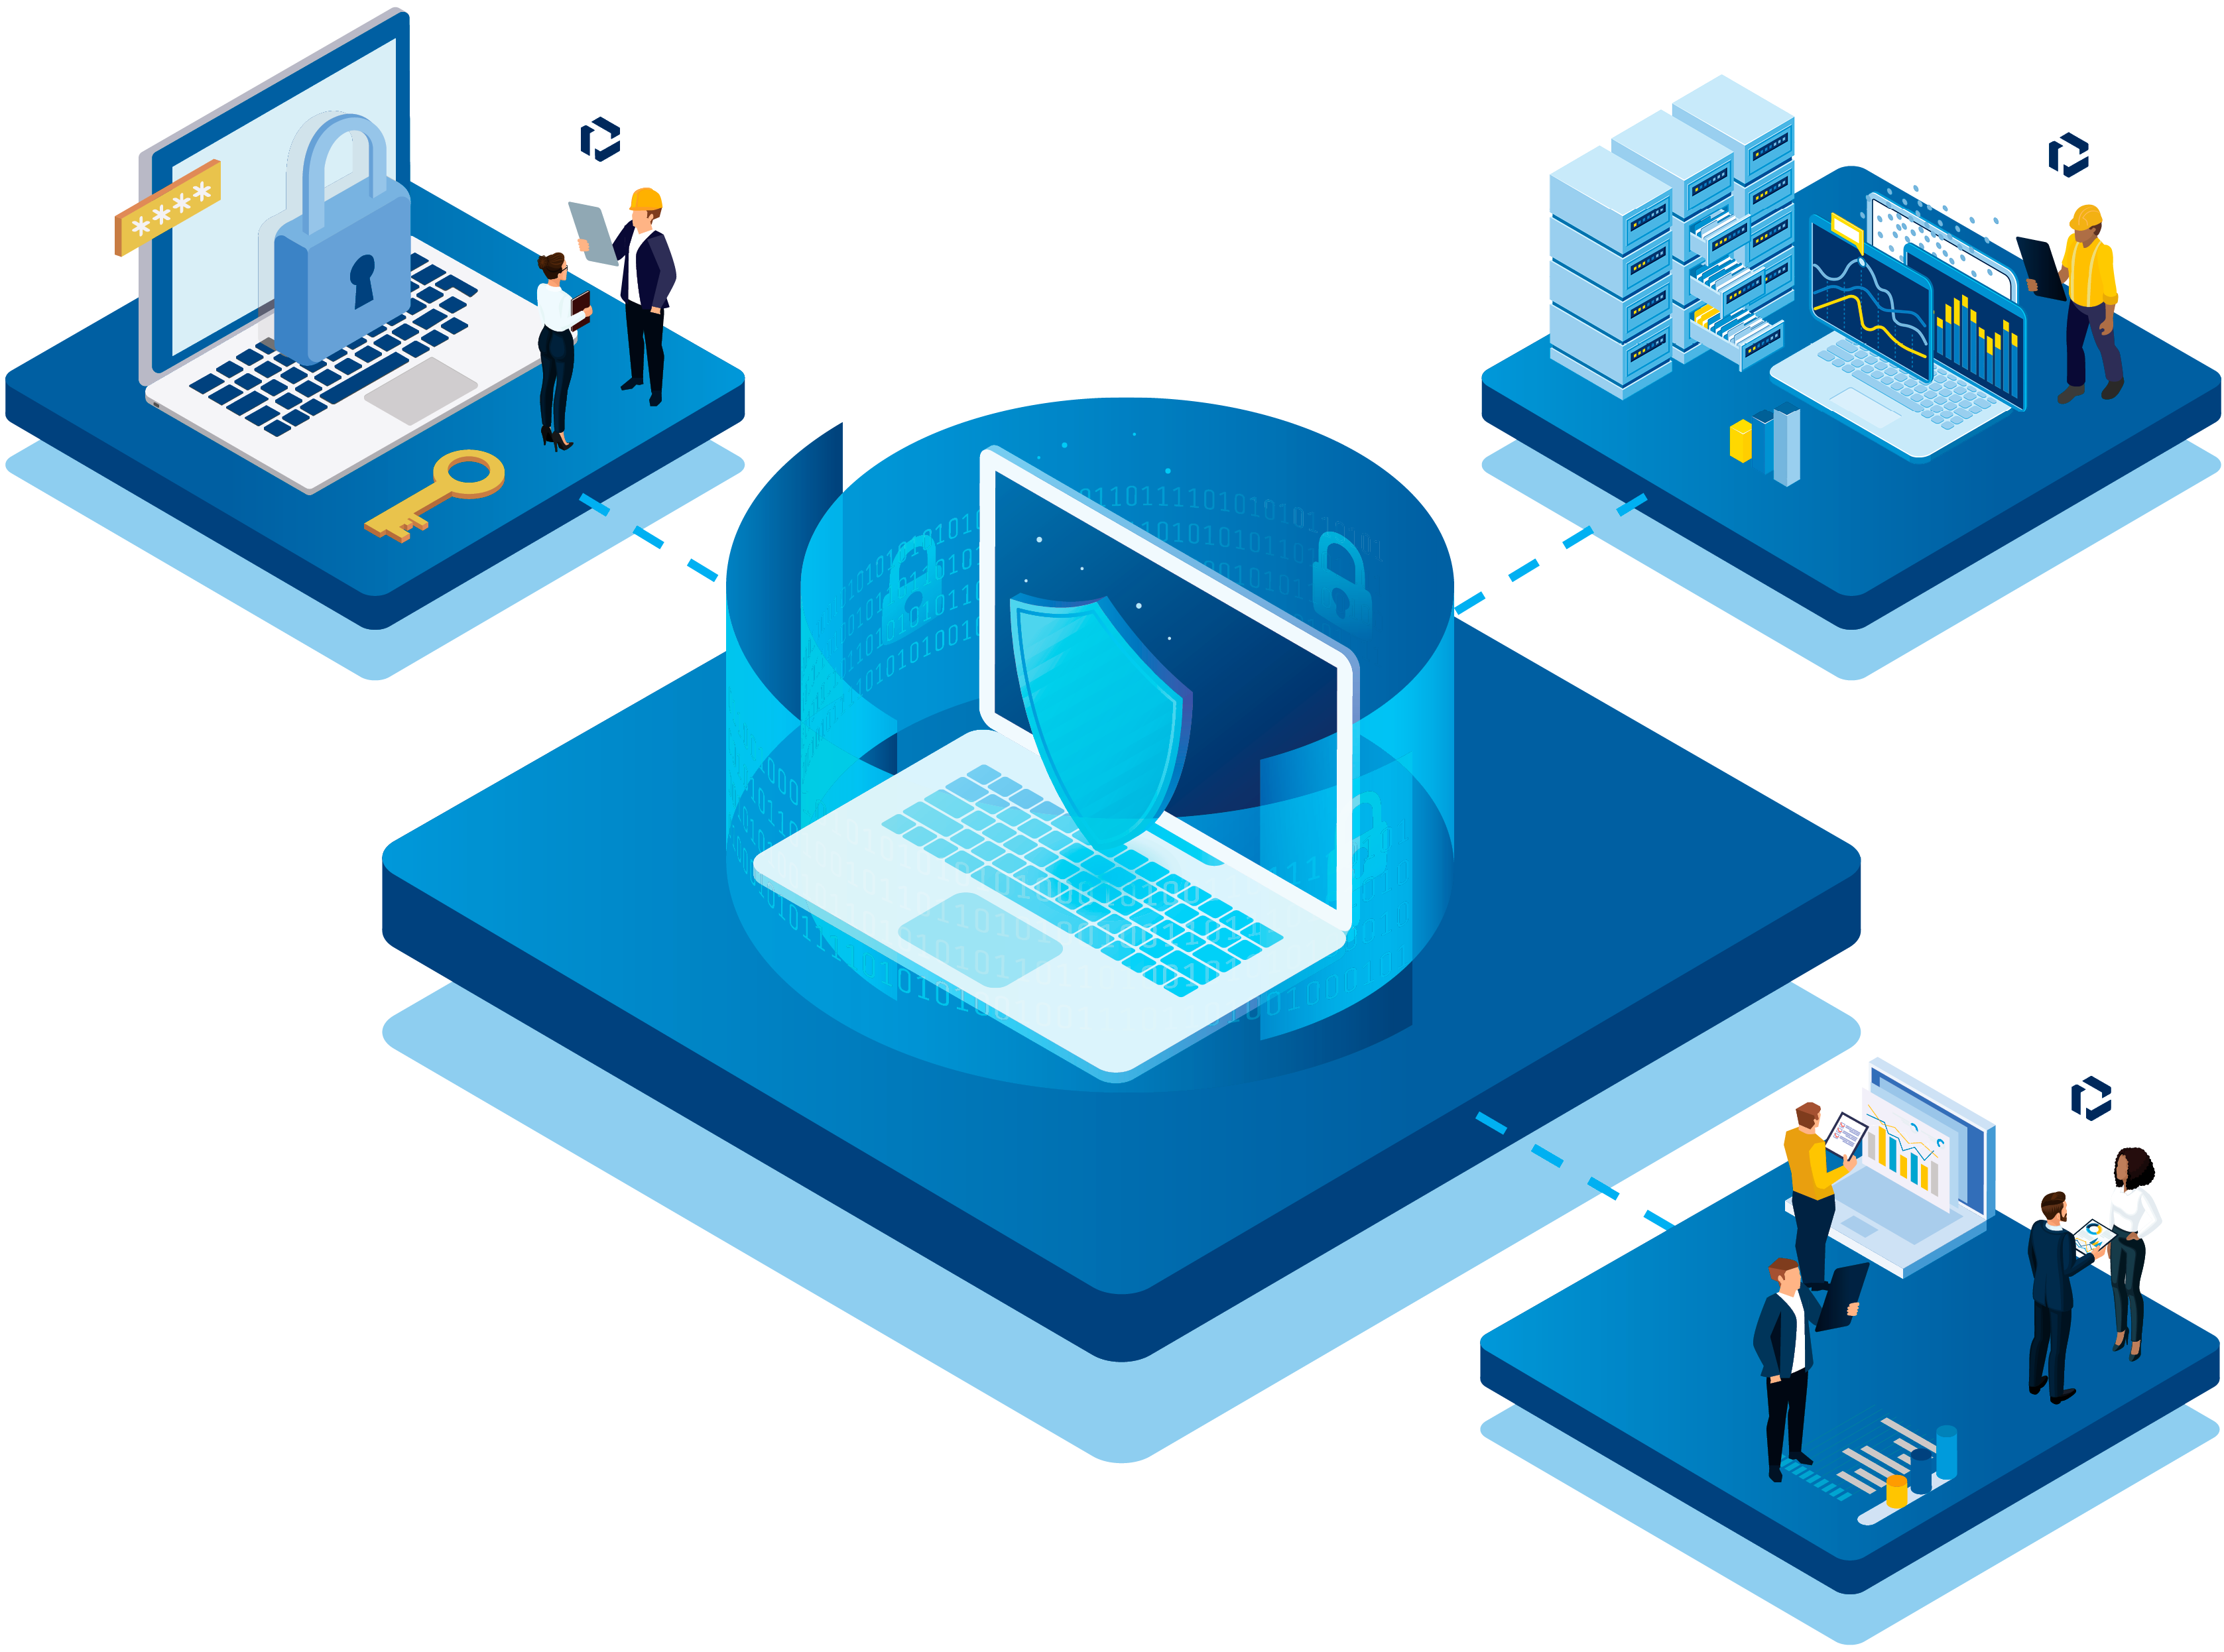 Trimble Connect Security Digital